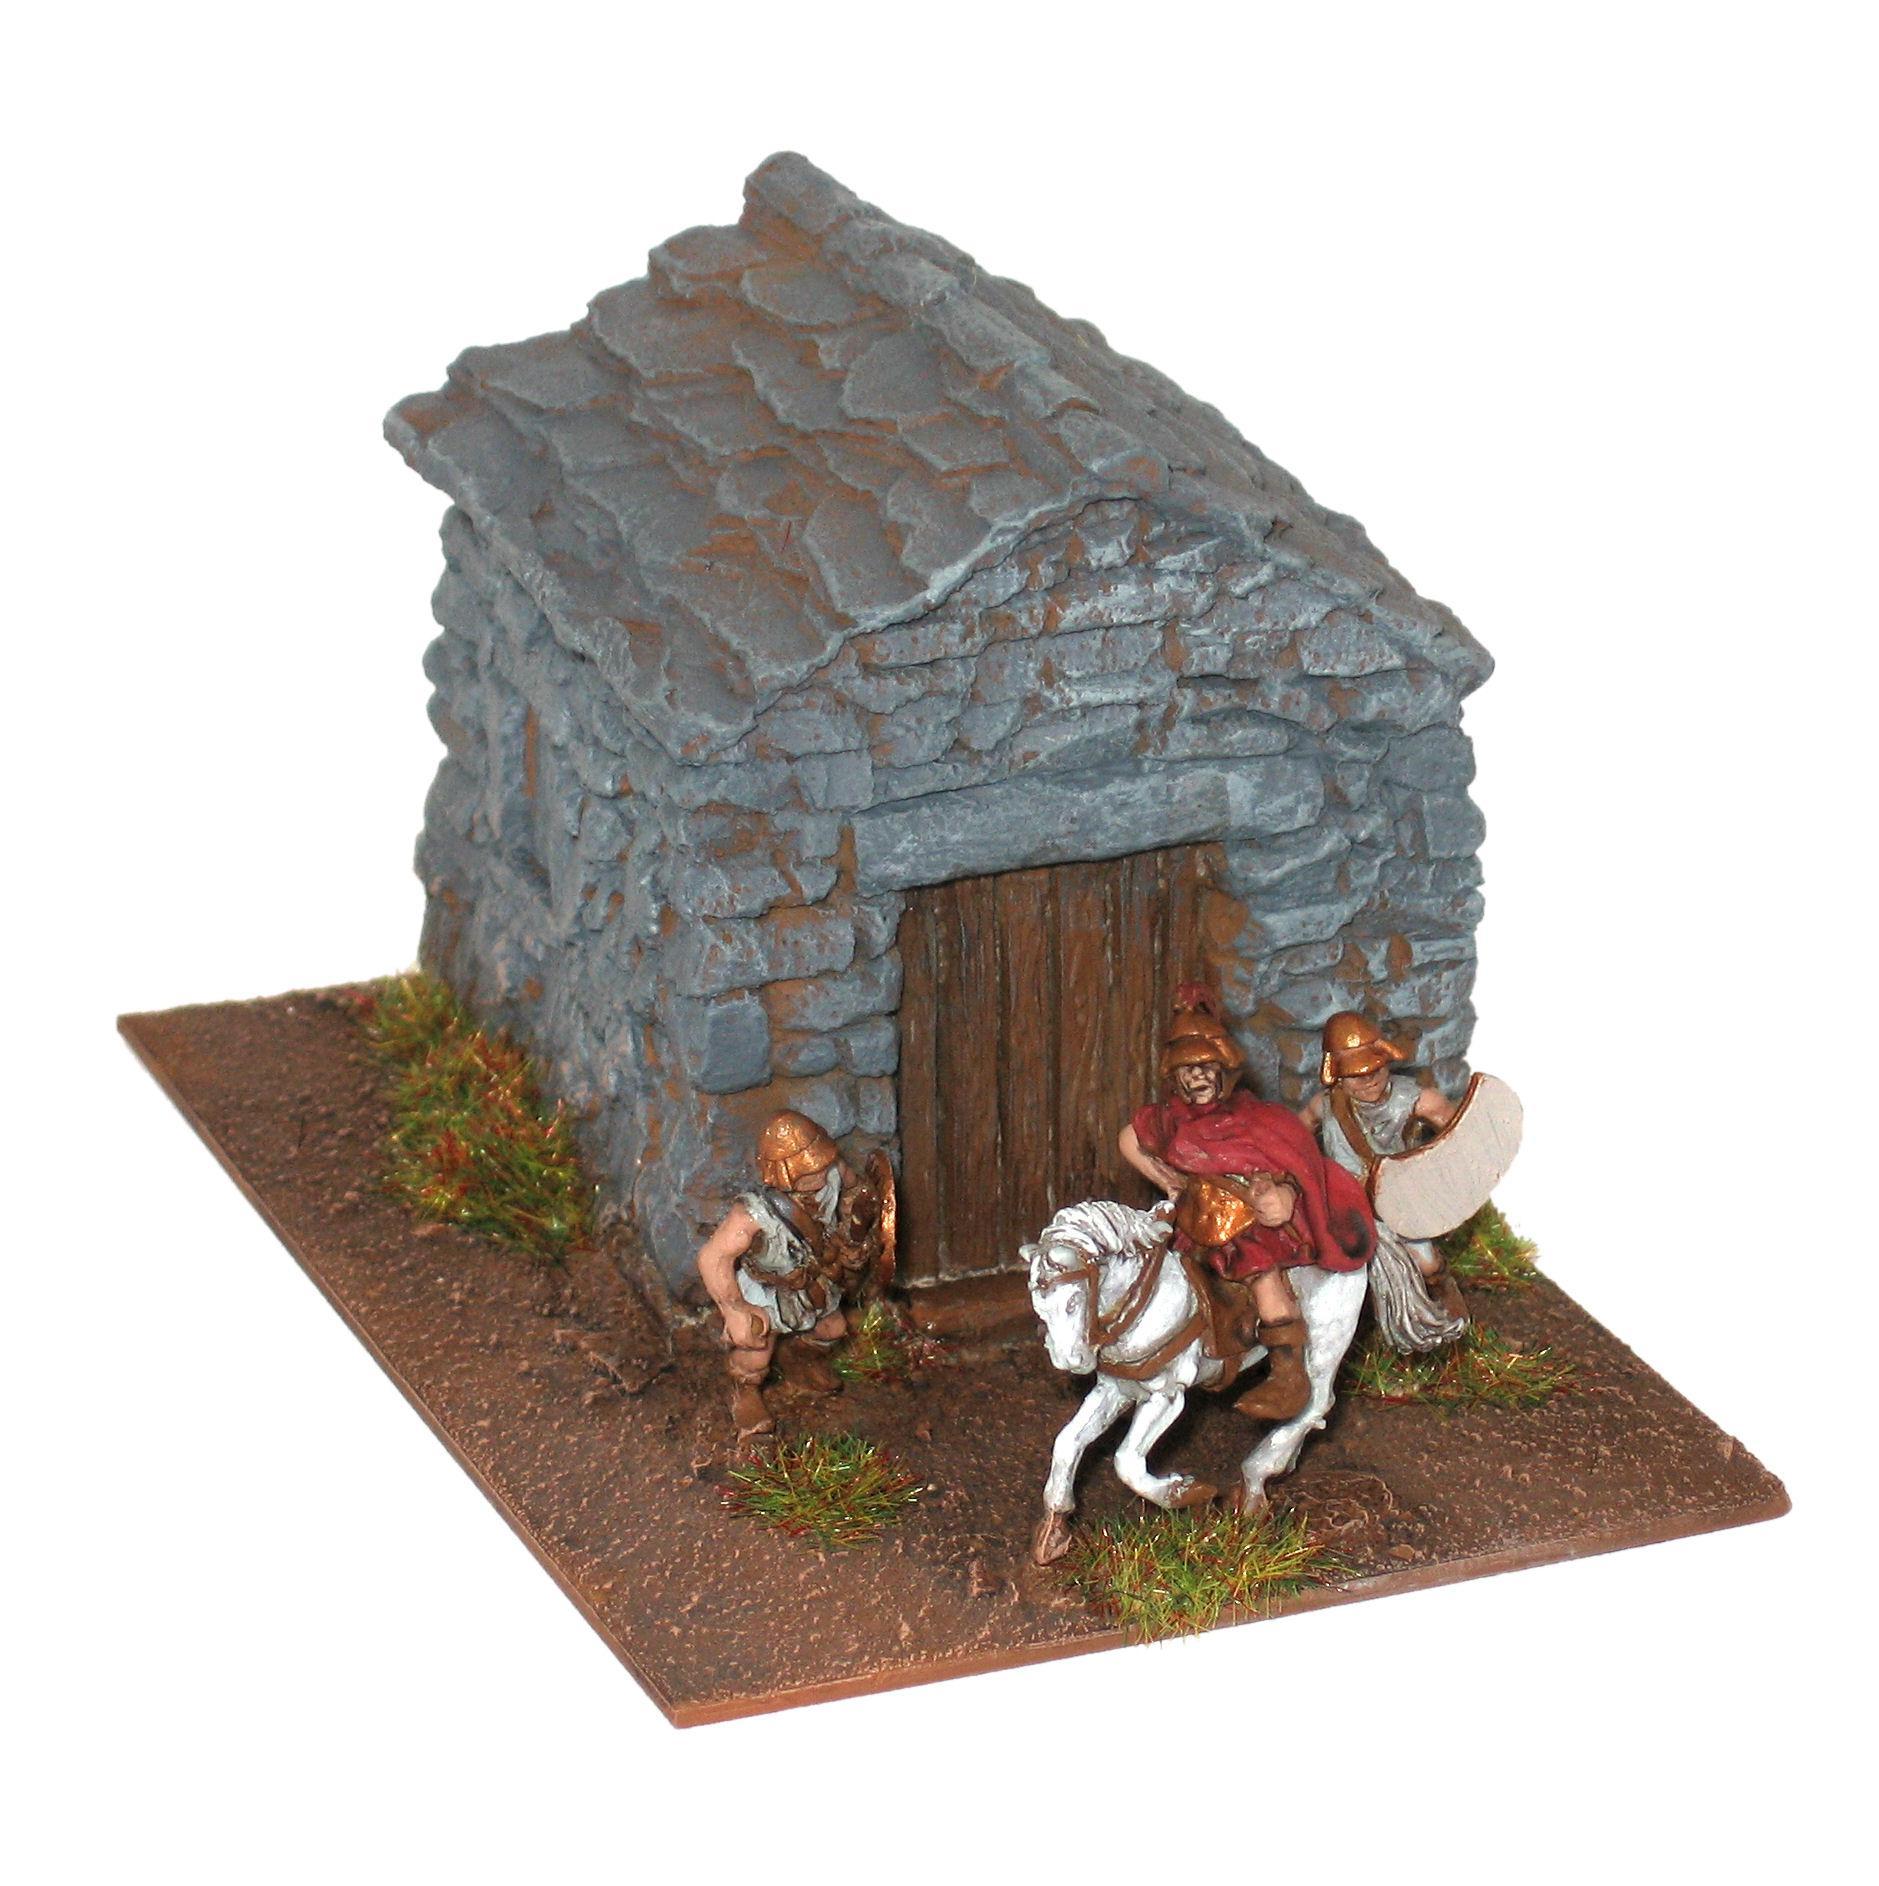 15mm, Antiquitatis, Bellis, Camp, Dba, Macedonian, Objective Marker, Terrain